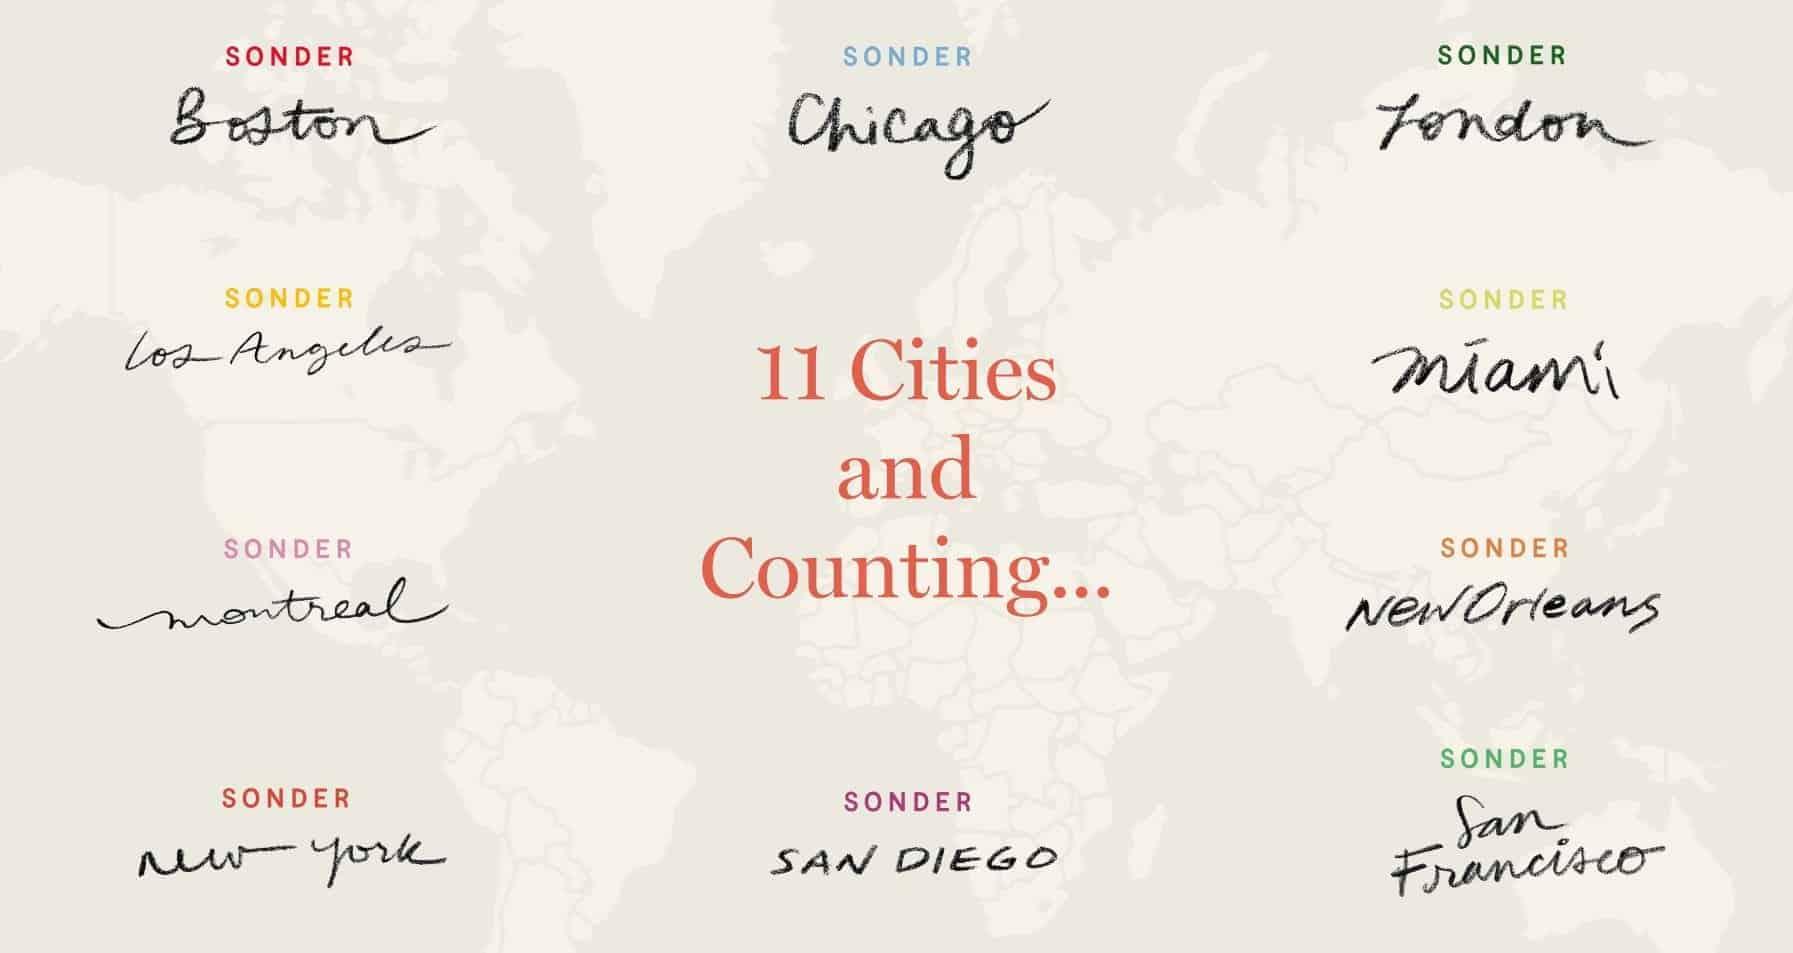 sonder cities